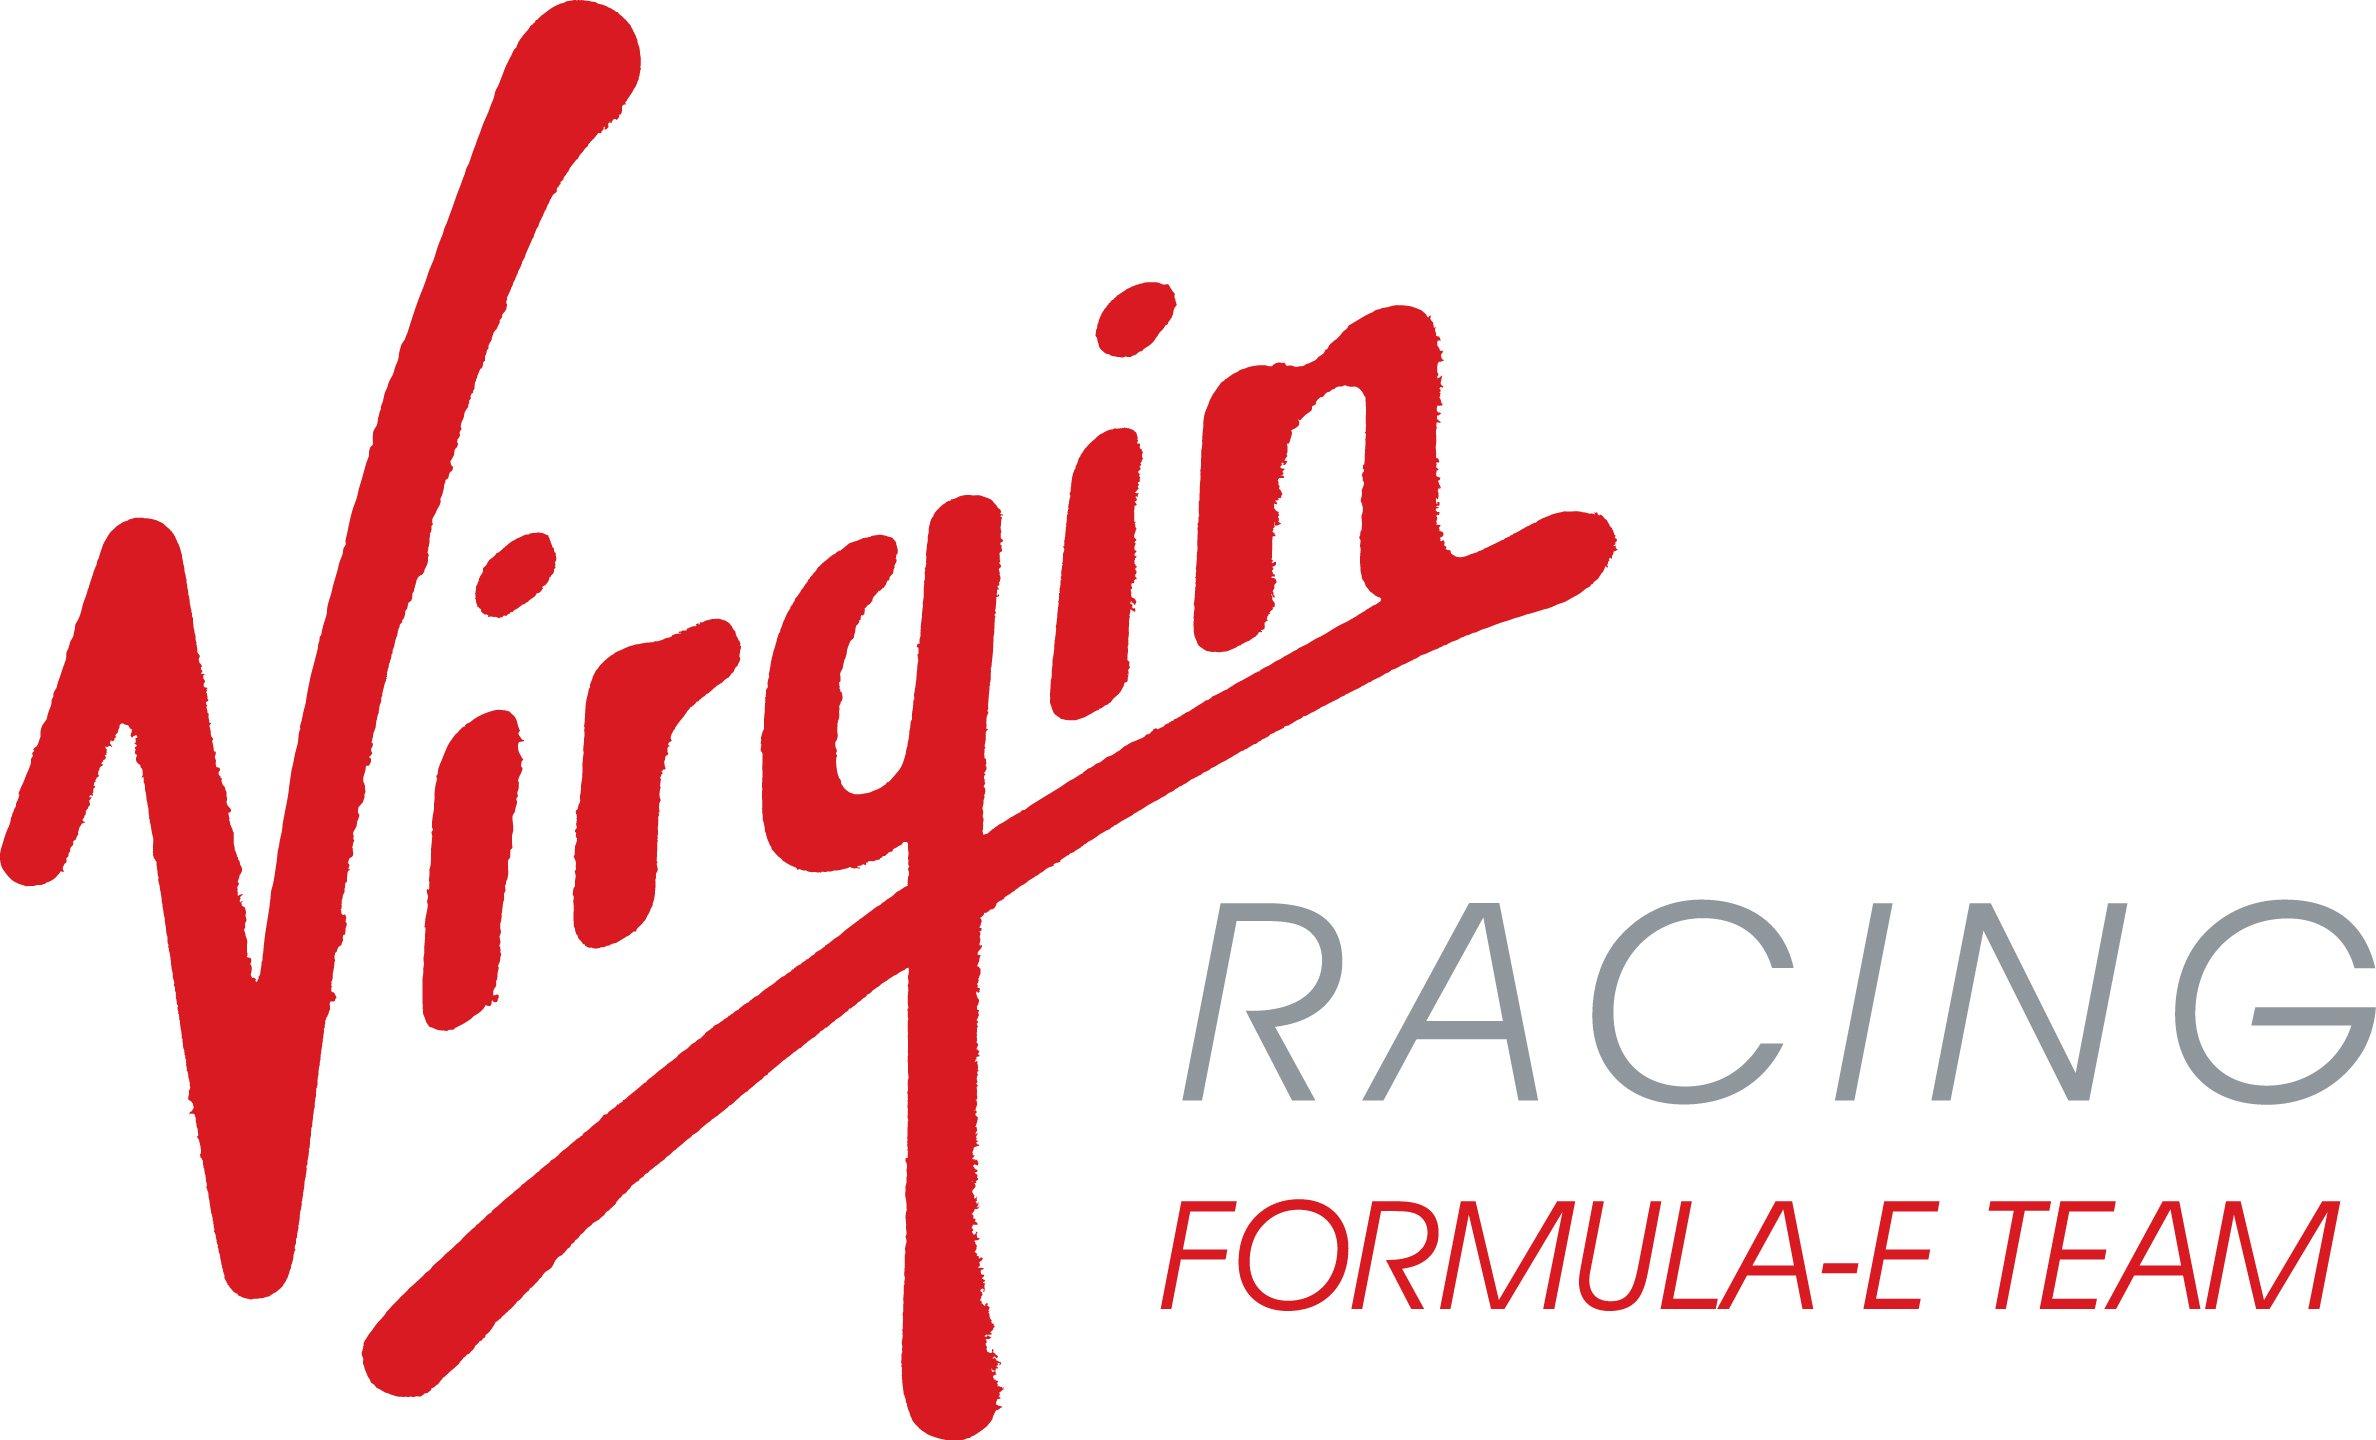 E Racing